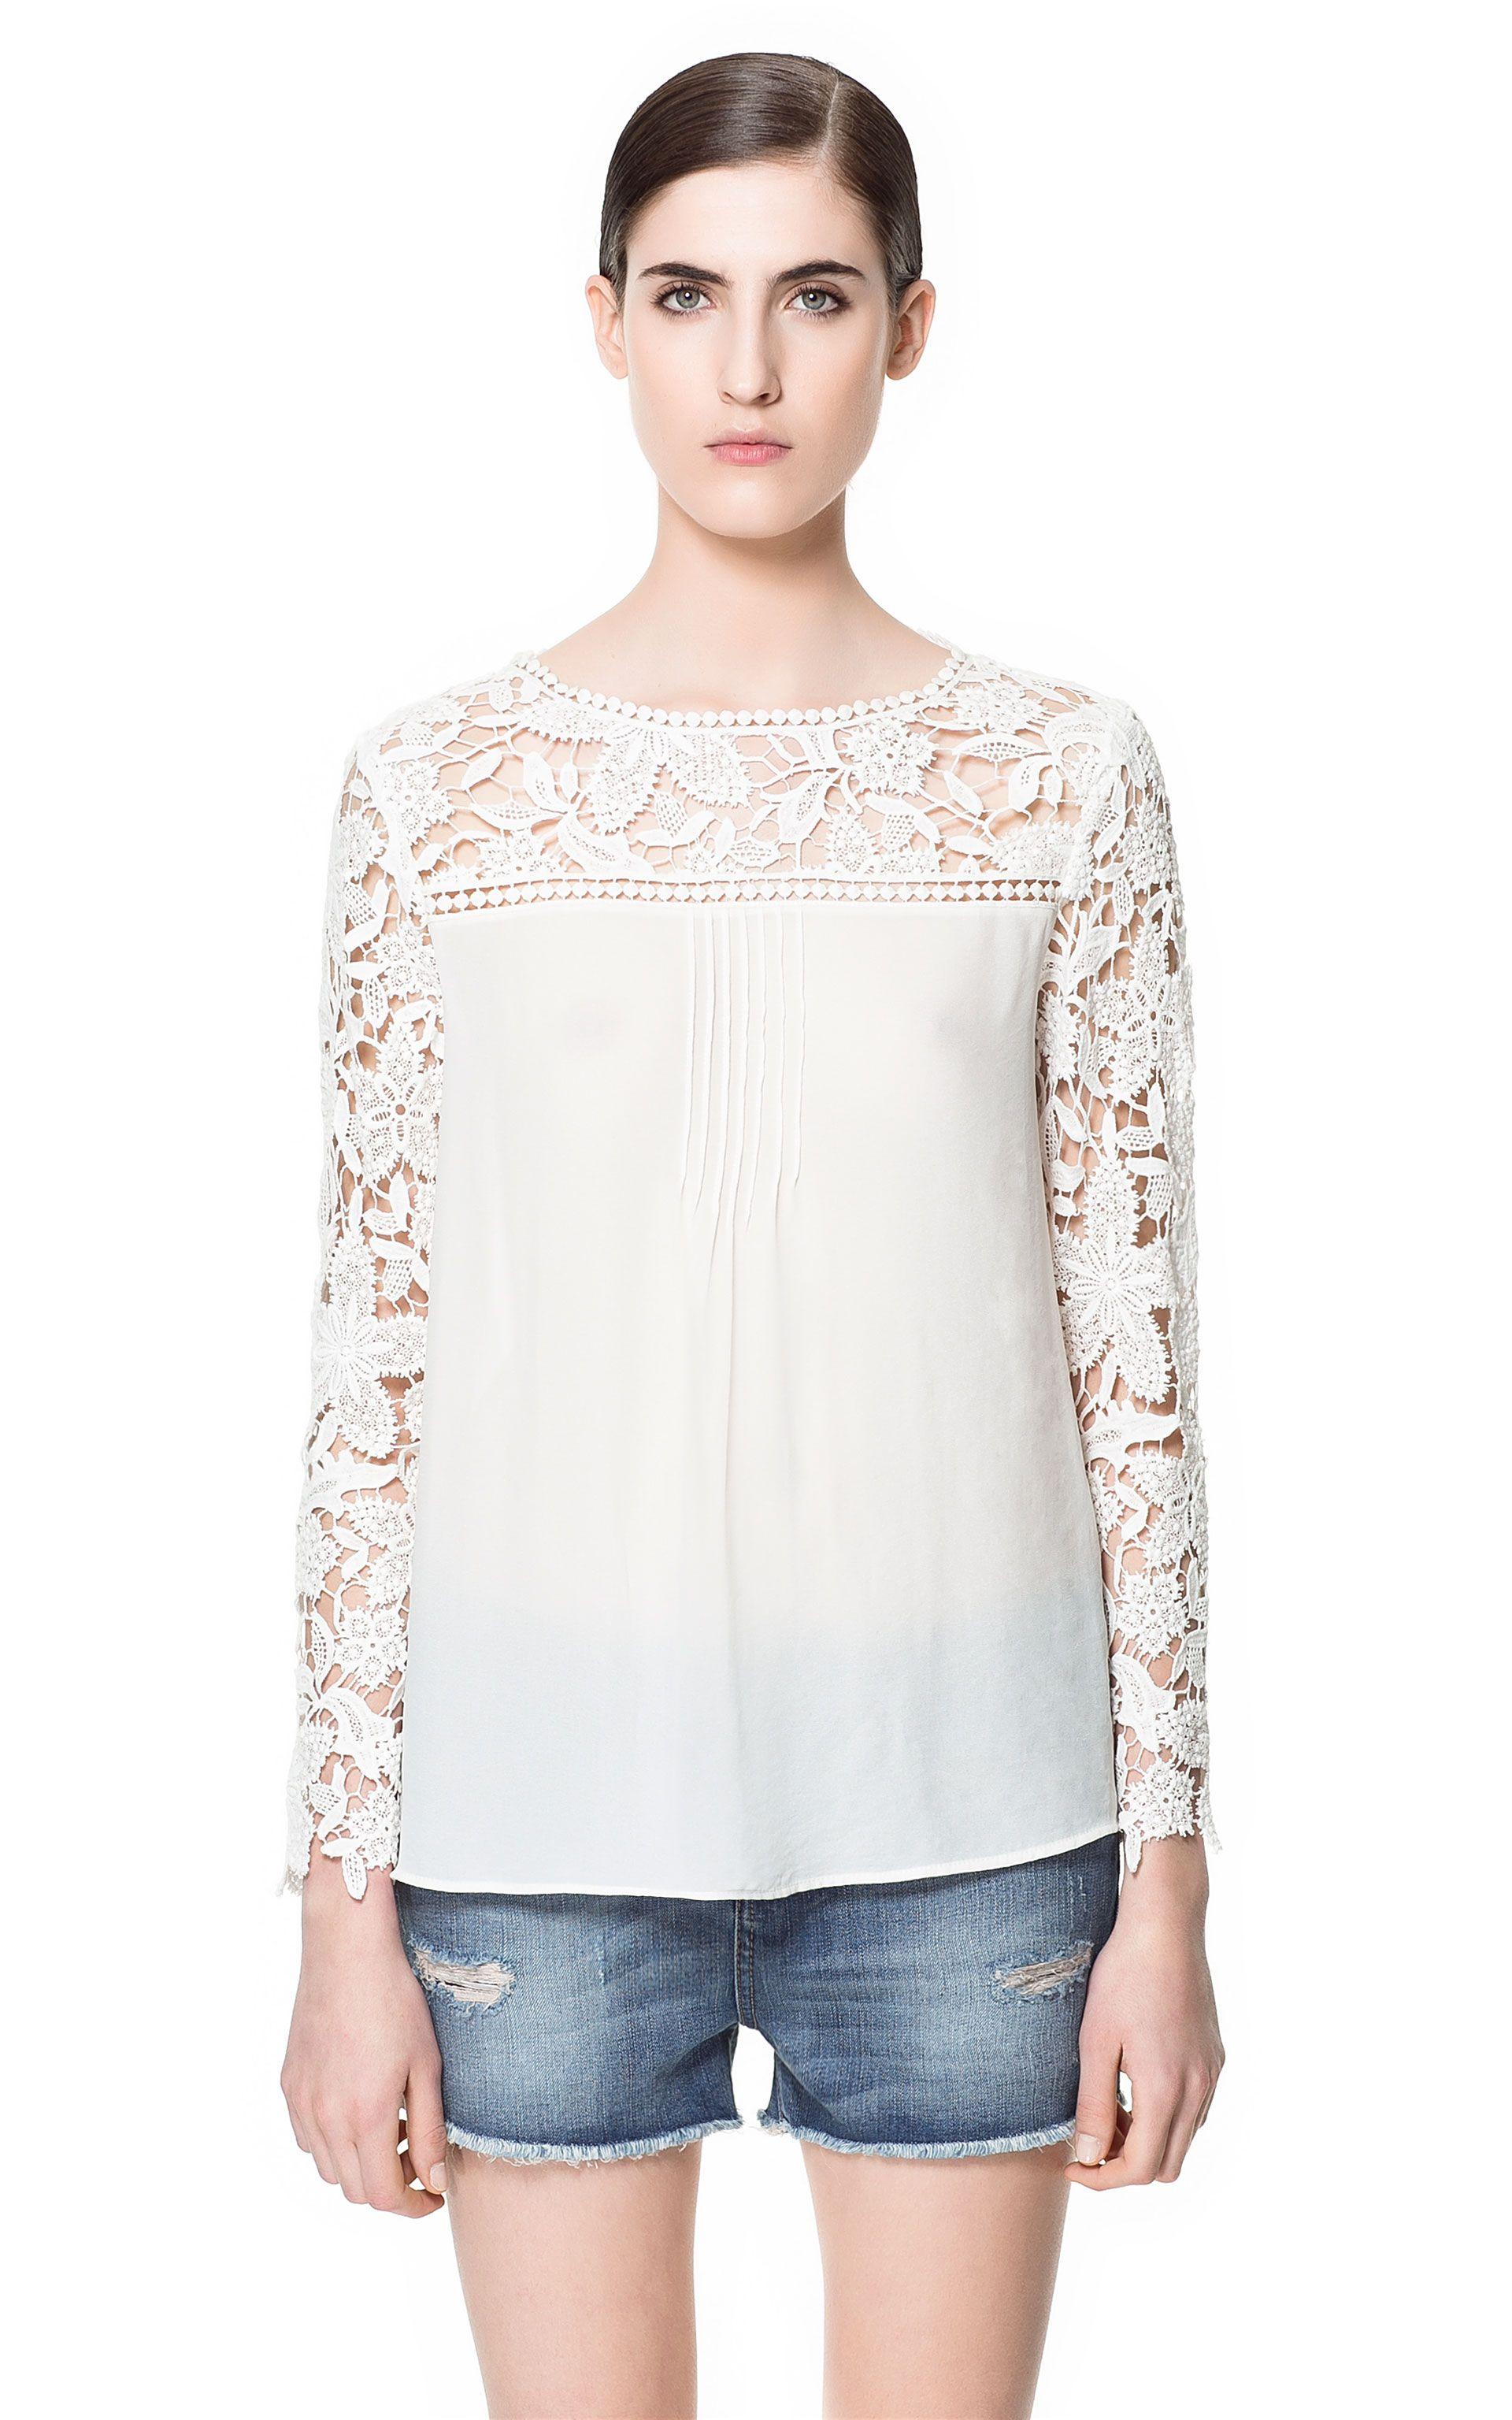 Semana Última Combinada Blusa Mujer Crochet Zara EspañaLo trdshQC